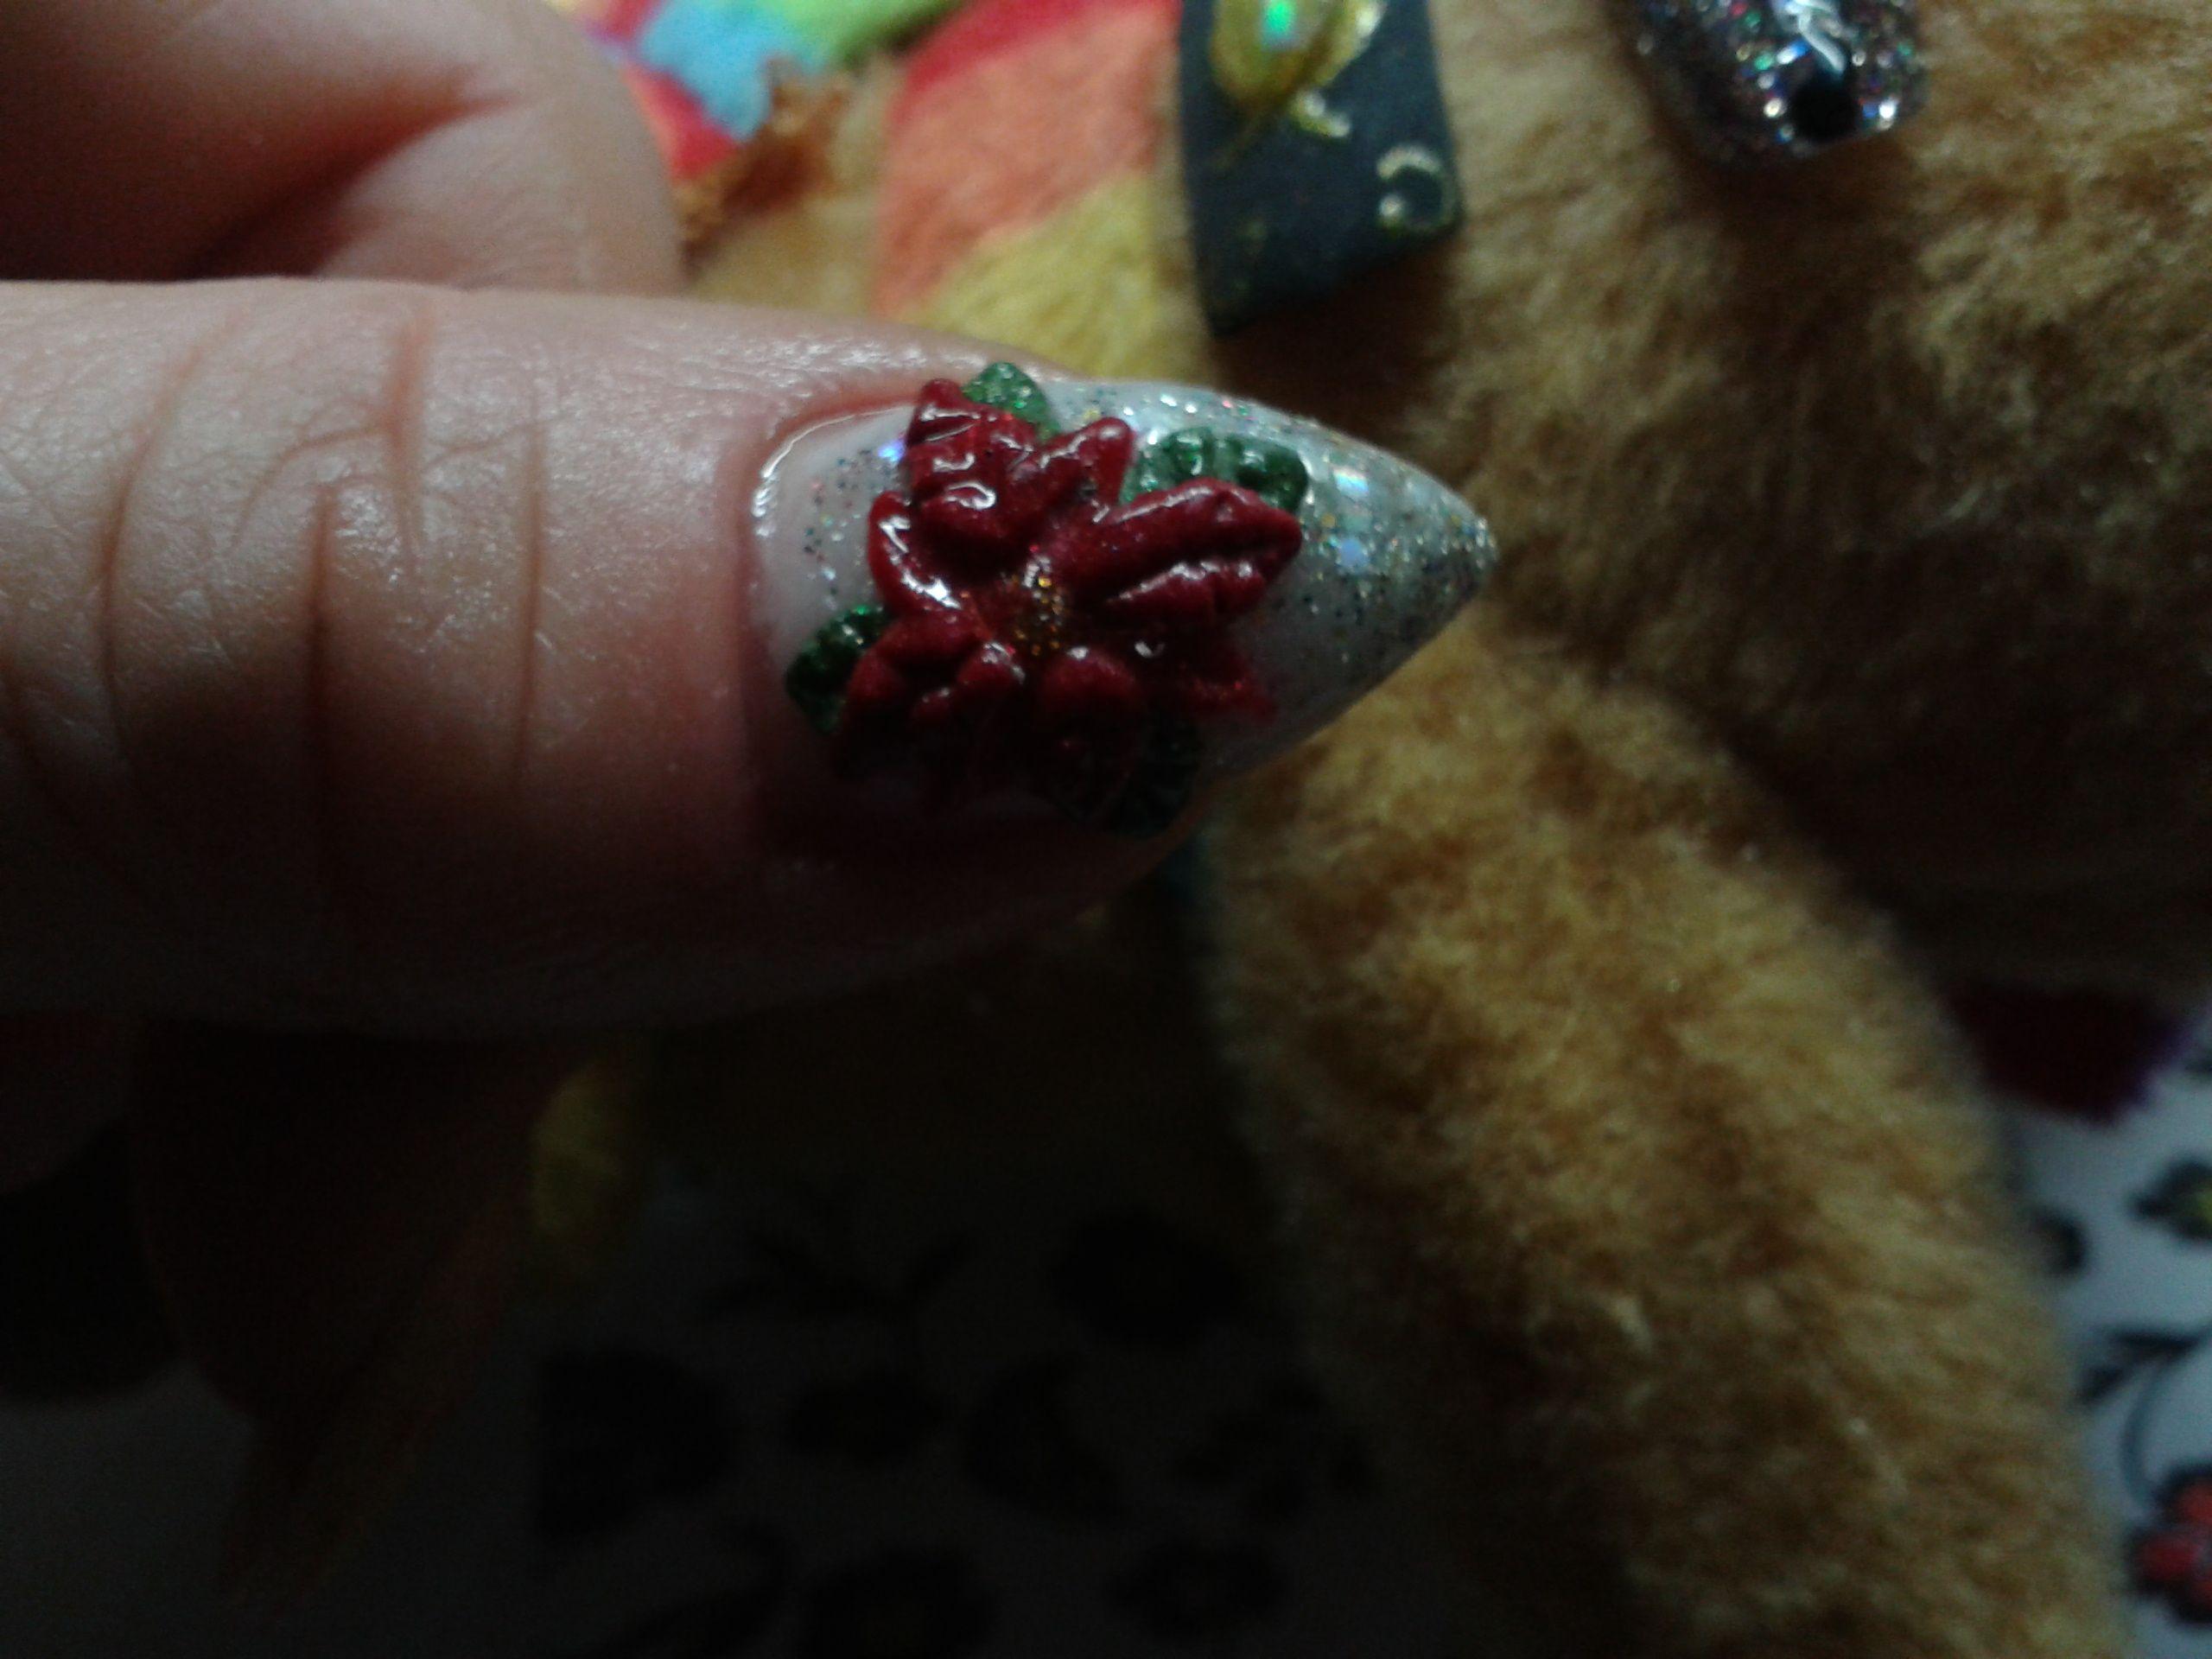 Acrylic poinsettia moje pomysły my nail design ideas pinterest